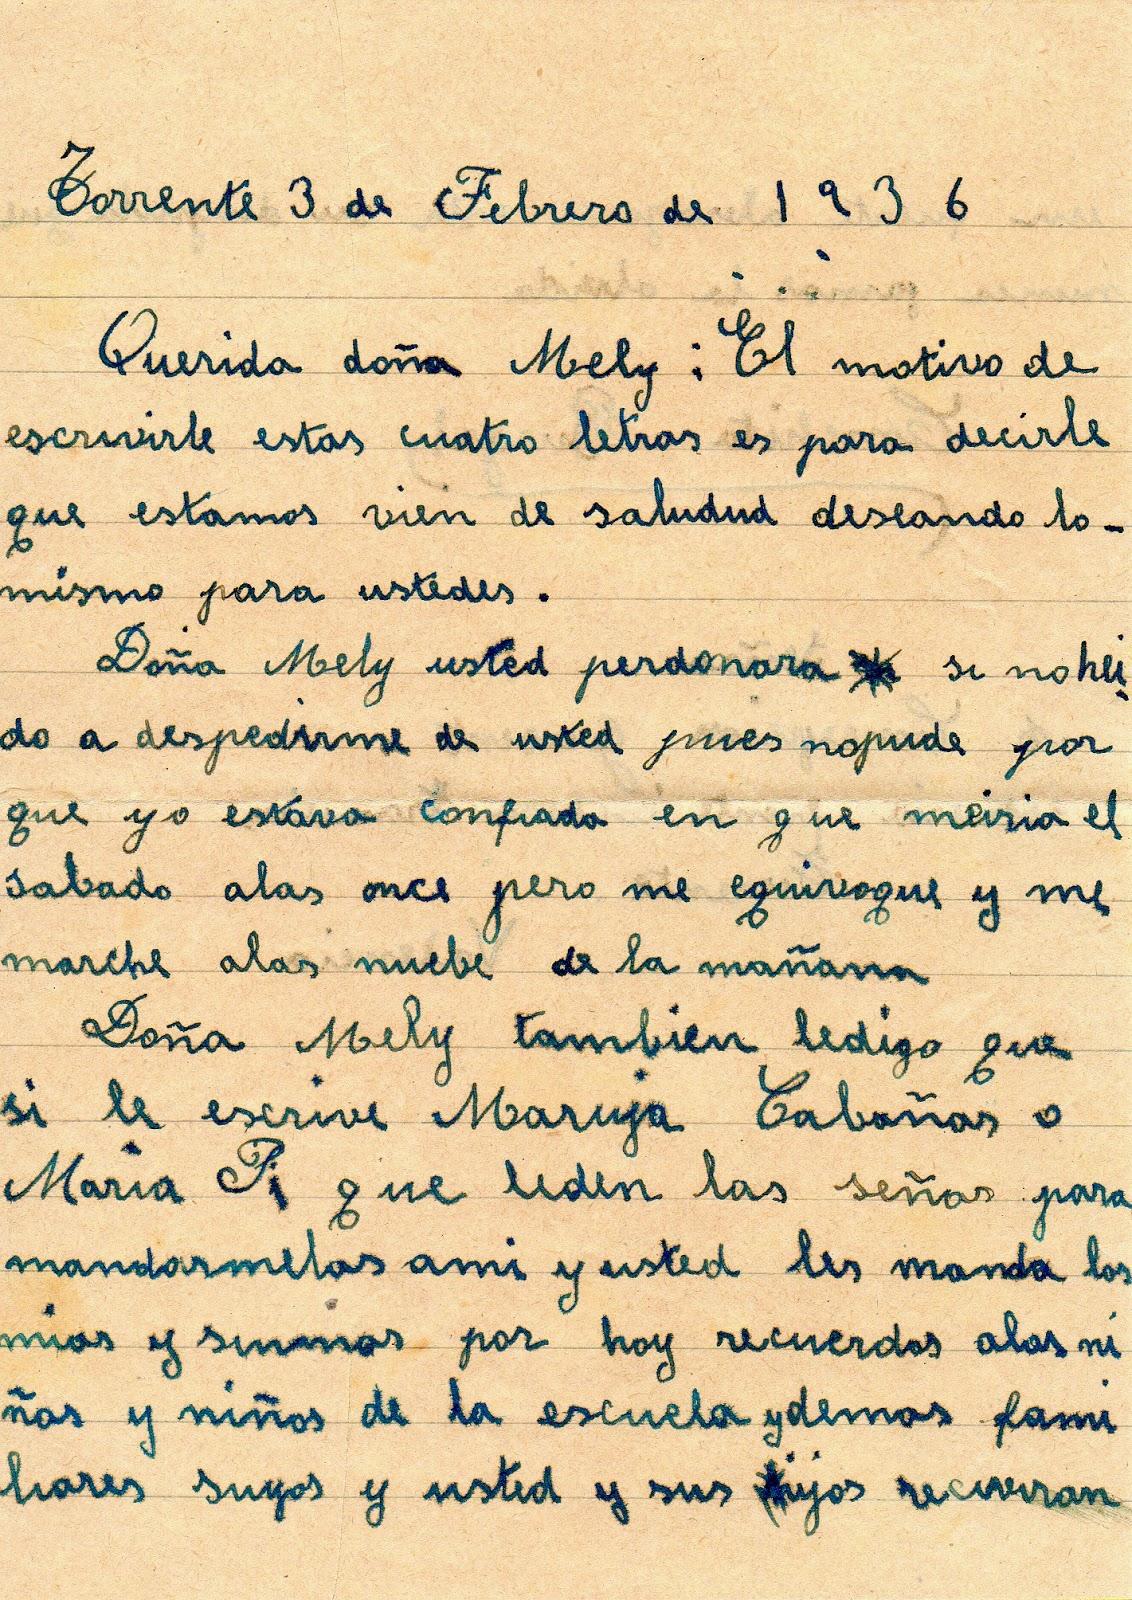 Melitina Álvaro Blázquez - 1936 - Carta de alumna 1